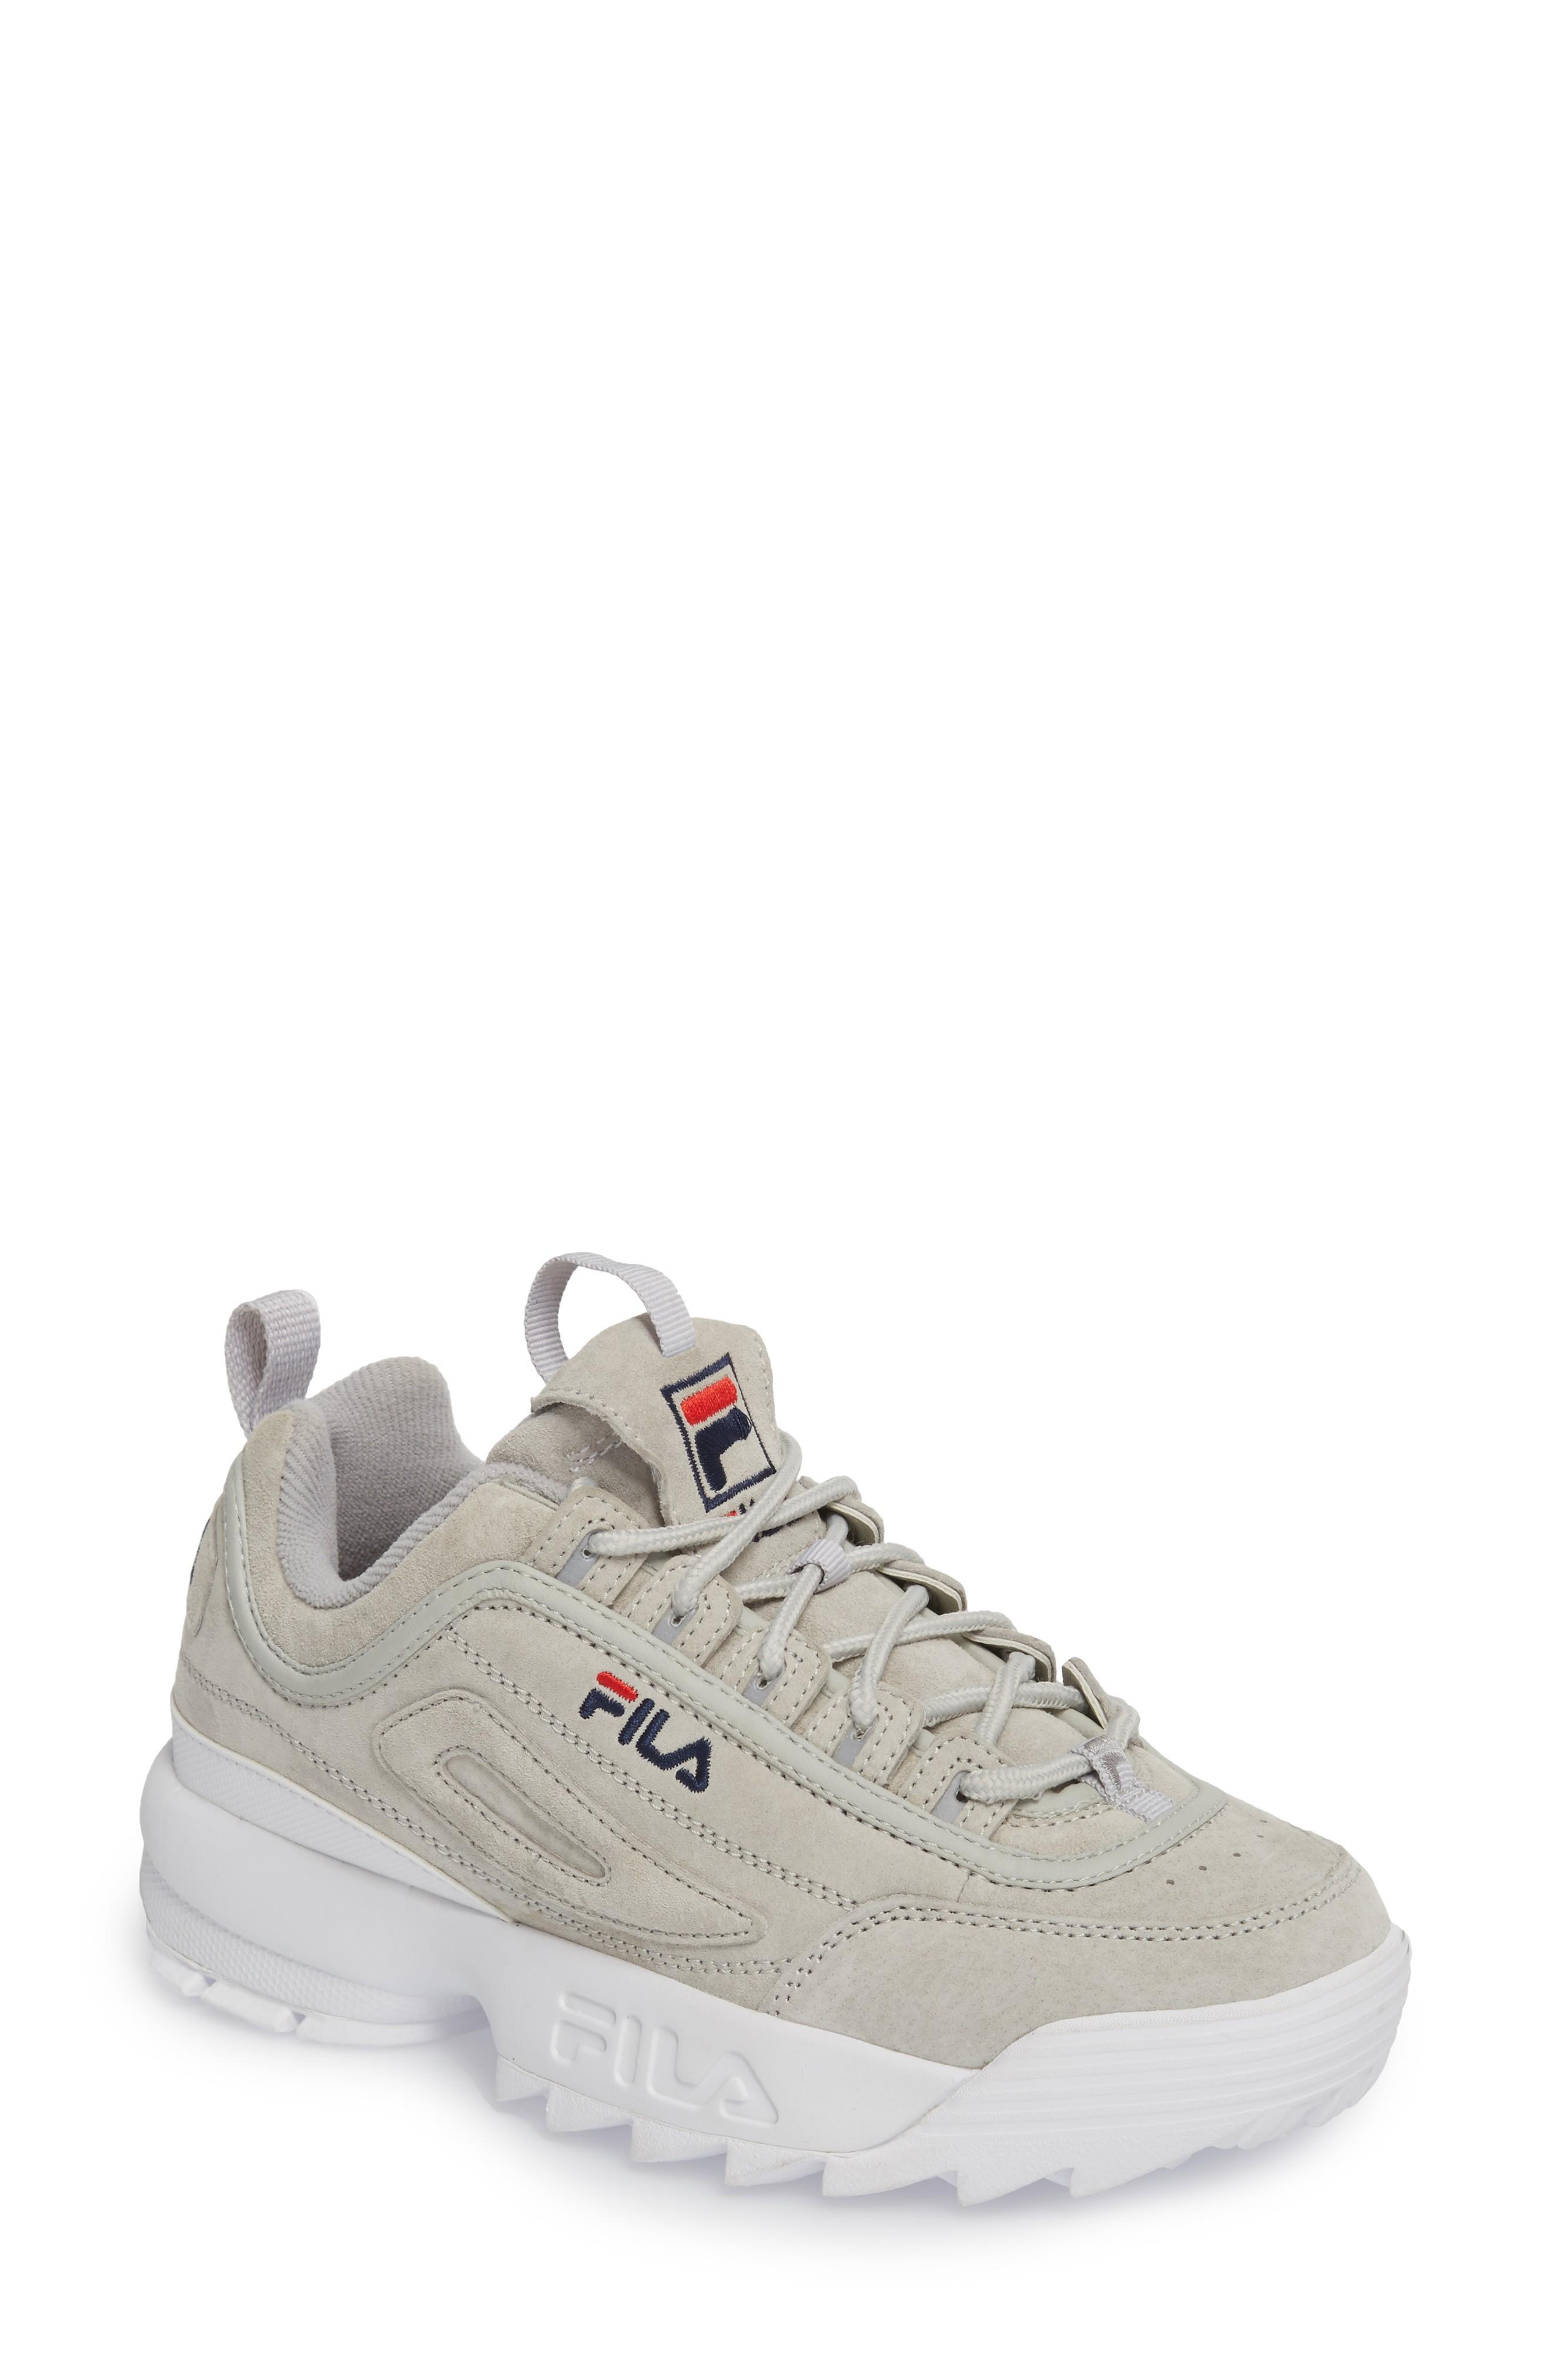 ed6675753201 Fila Disruptor Ii Premium Suede Sneaker In Gryv  Gryv  Wht